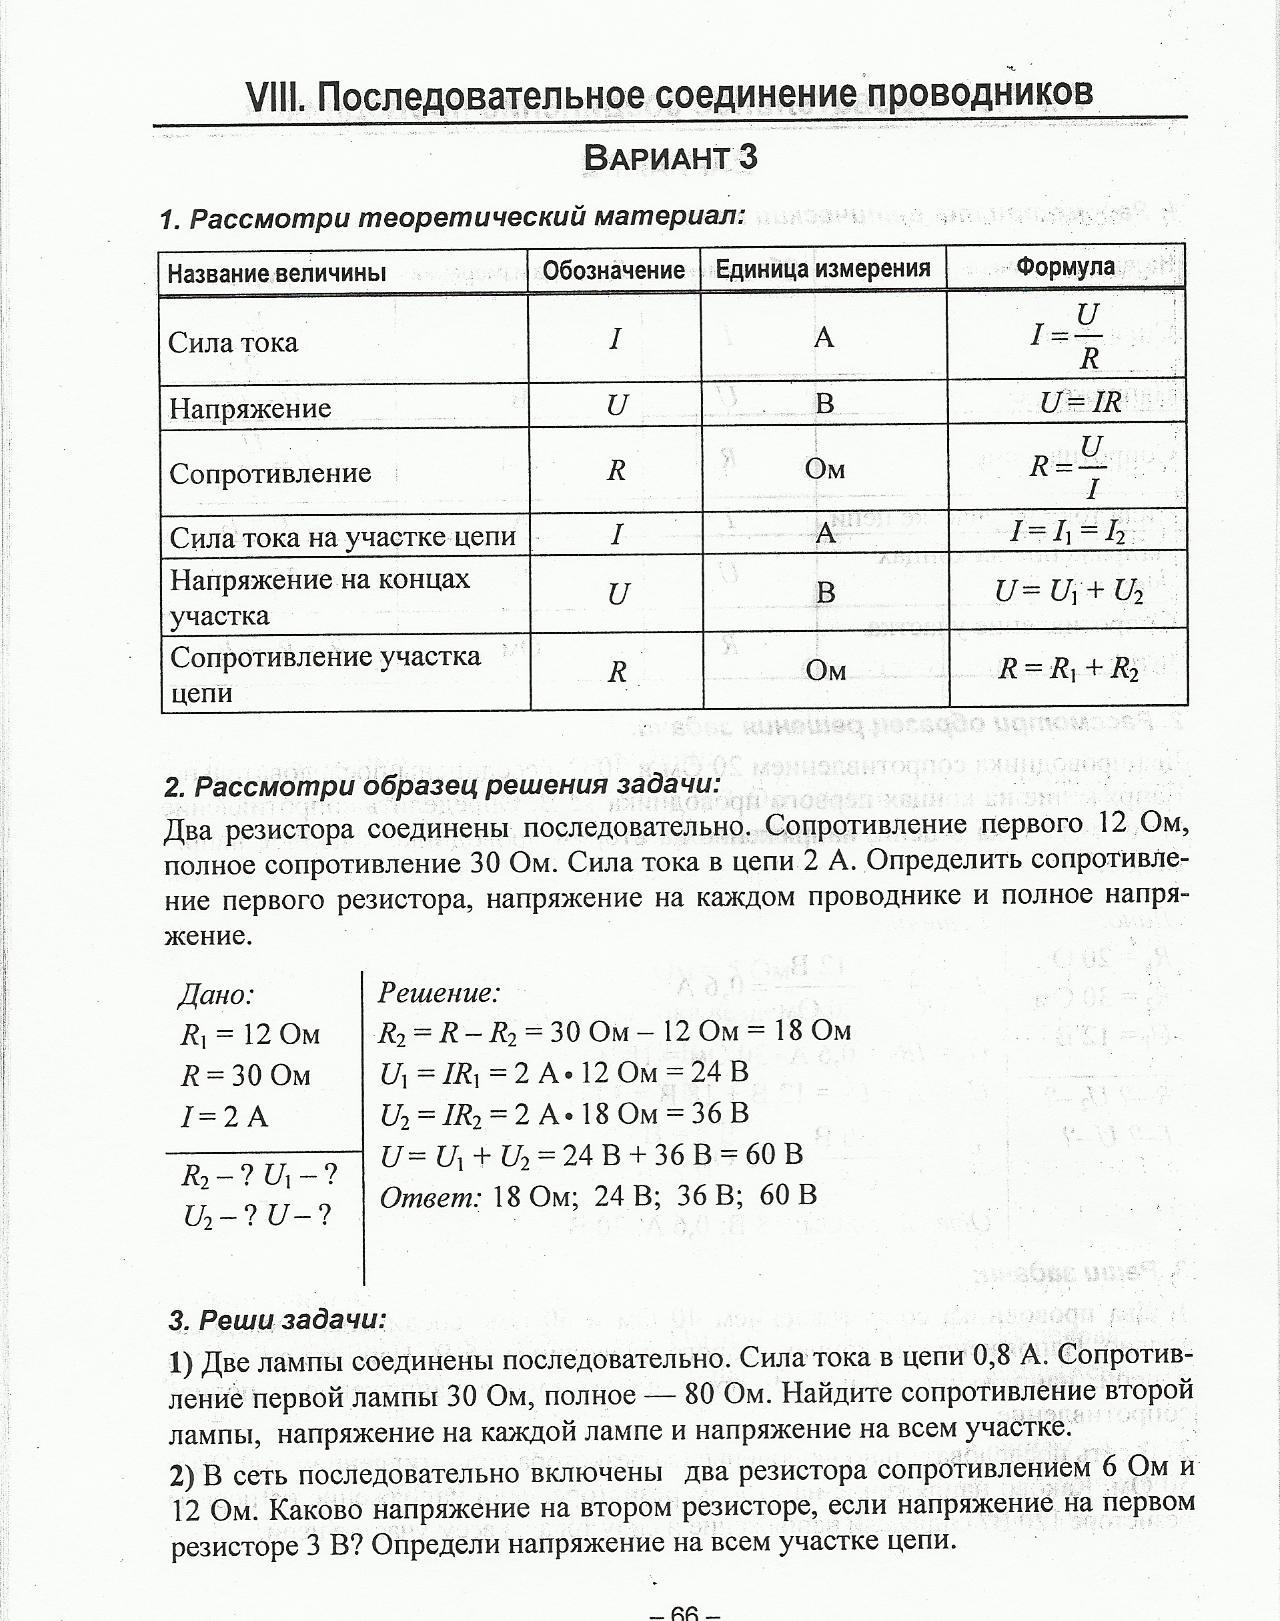 C:\Documents and Settings\руфина\Рабочий стол\сертиф2\Scanв3.jpg